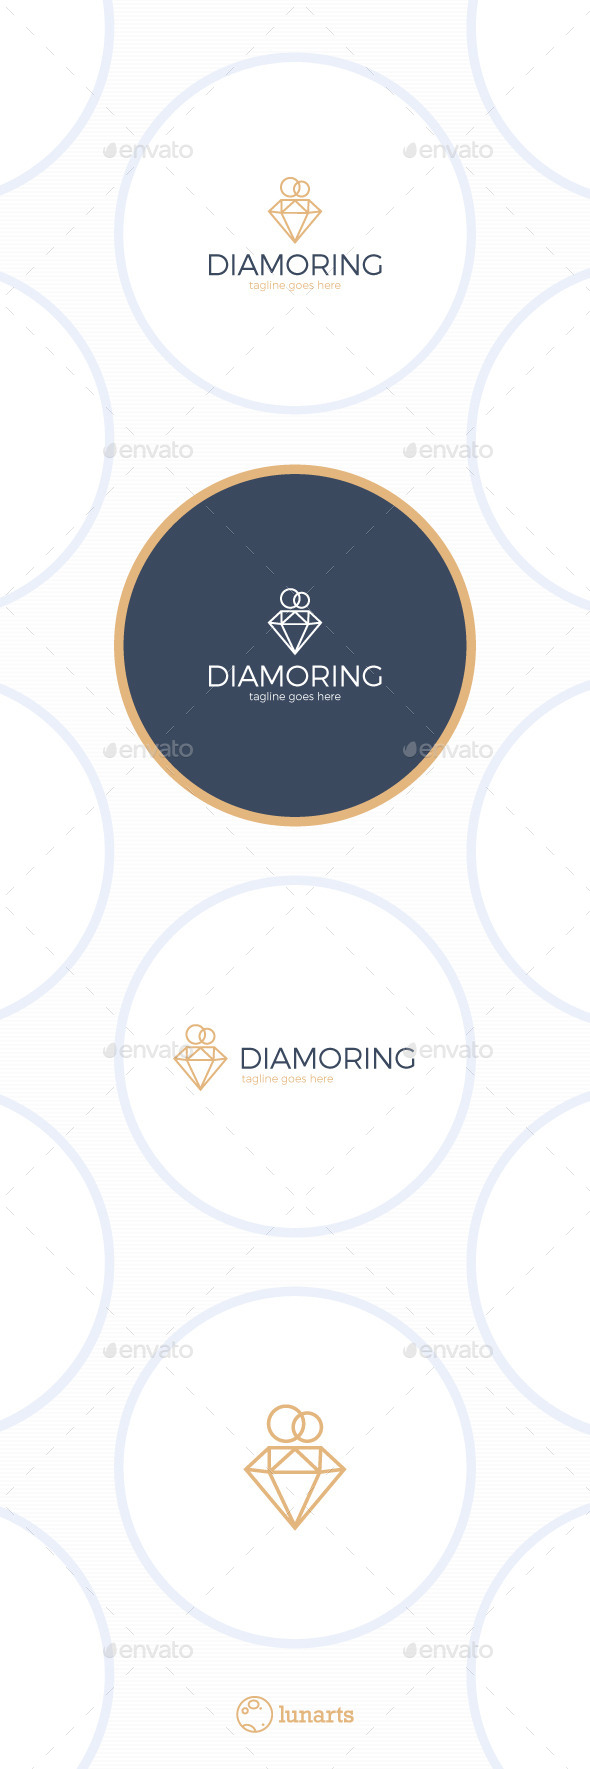 Diamond Ring Logo - Wedding Jewelry - Symbols Logo Templates